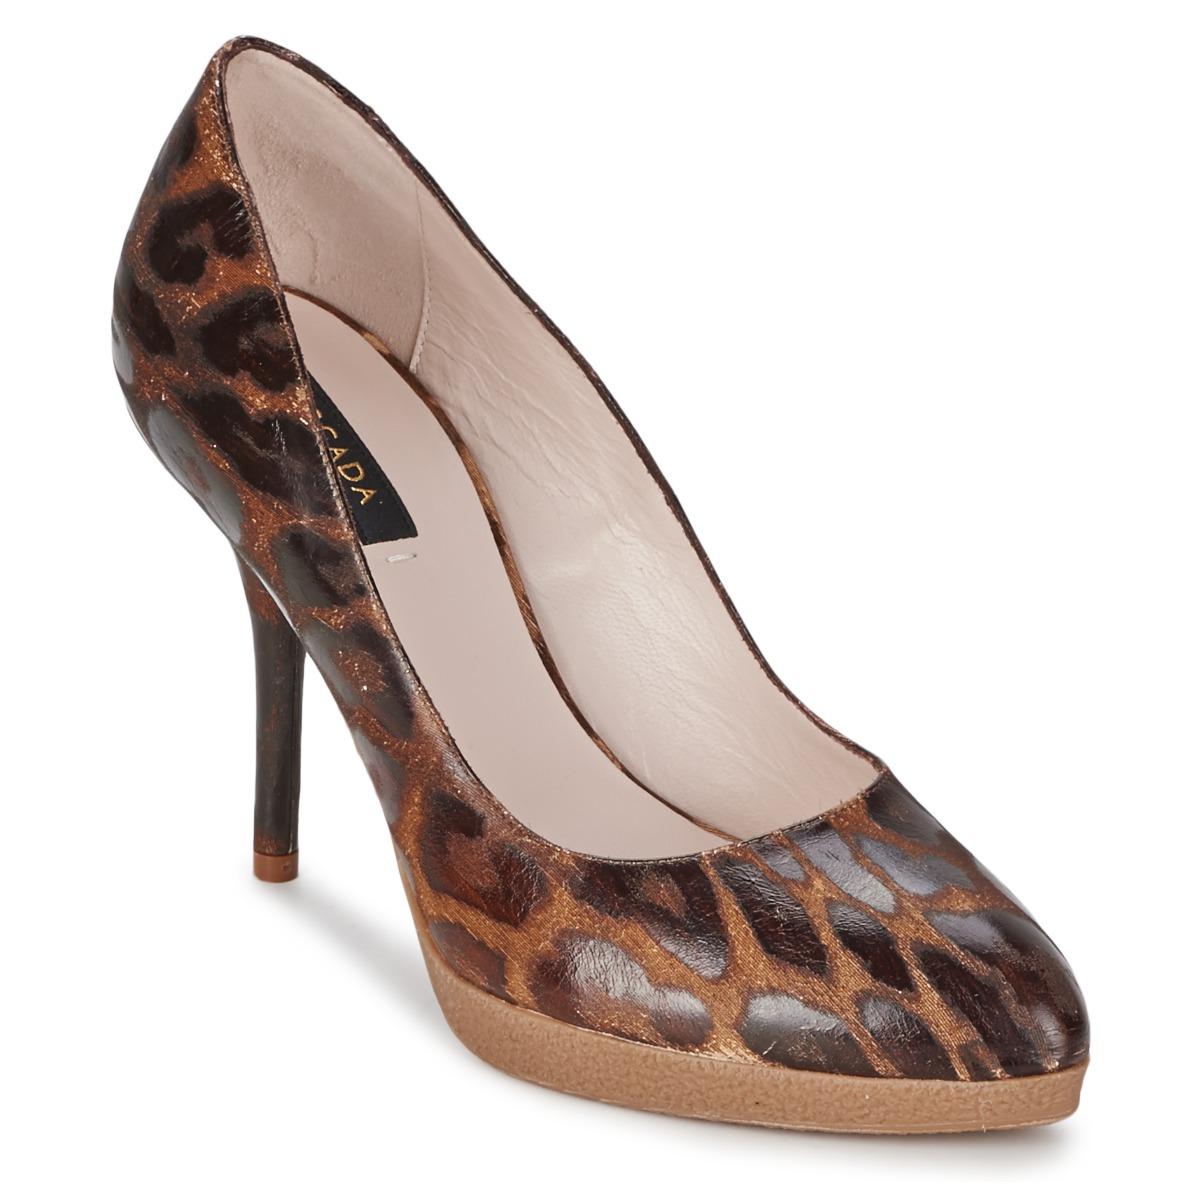 Escada AS701 Braun / Leopard - Kostenloser Versand bei Spartoode ! - Schuhe Pumps Damen 192,00 €